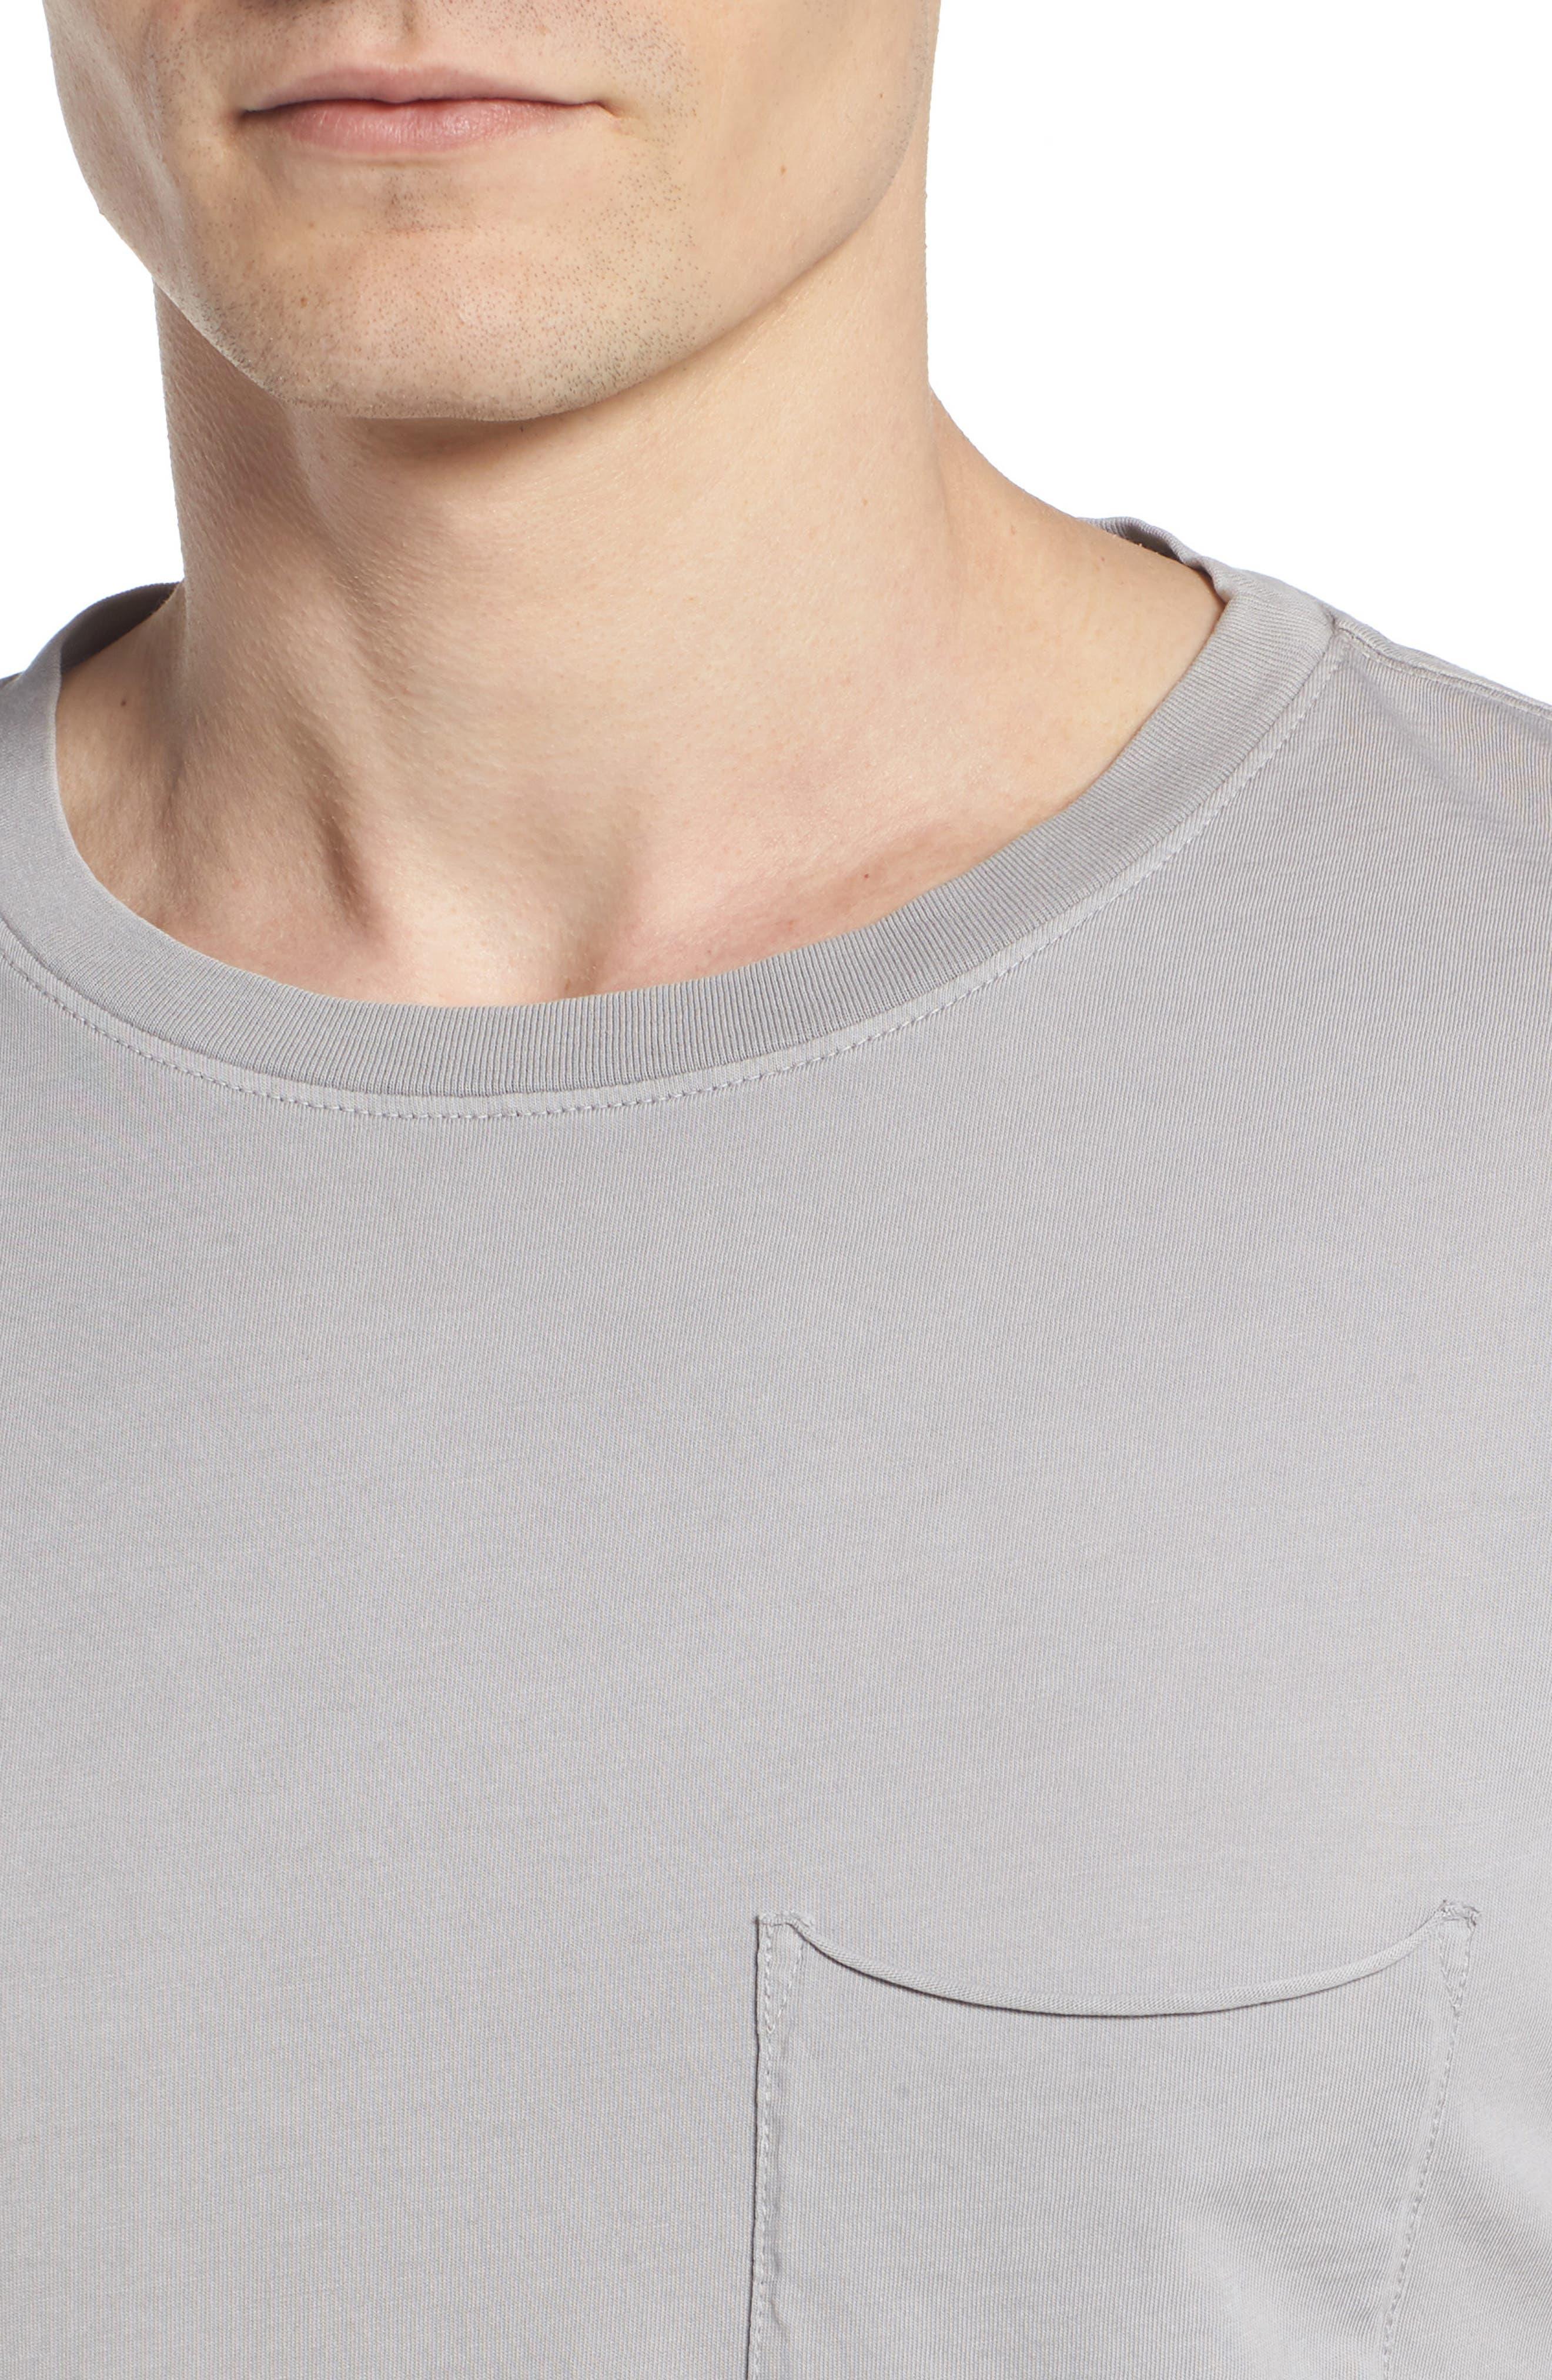 Anders Slim Fit Pocket T-Shirt,                             Alternate thumbnail 4, color,                             SUN FADED PEBBLE BEACH